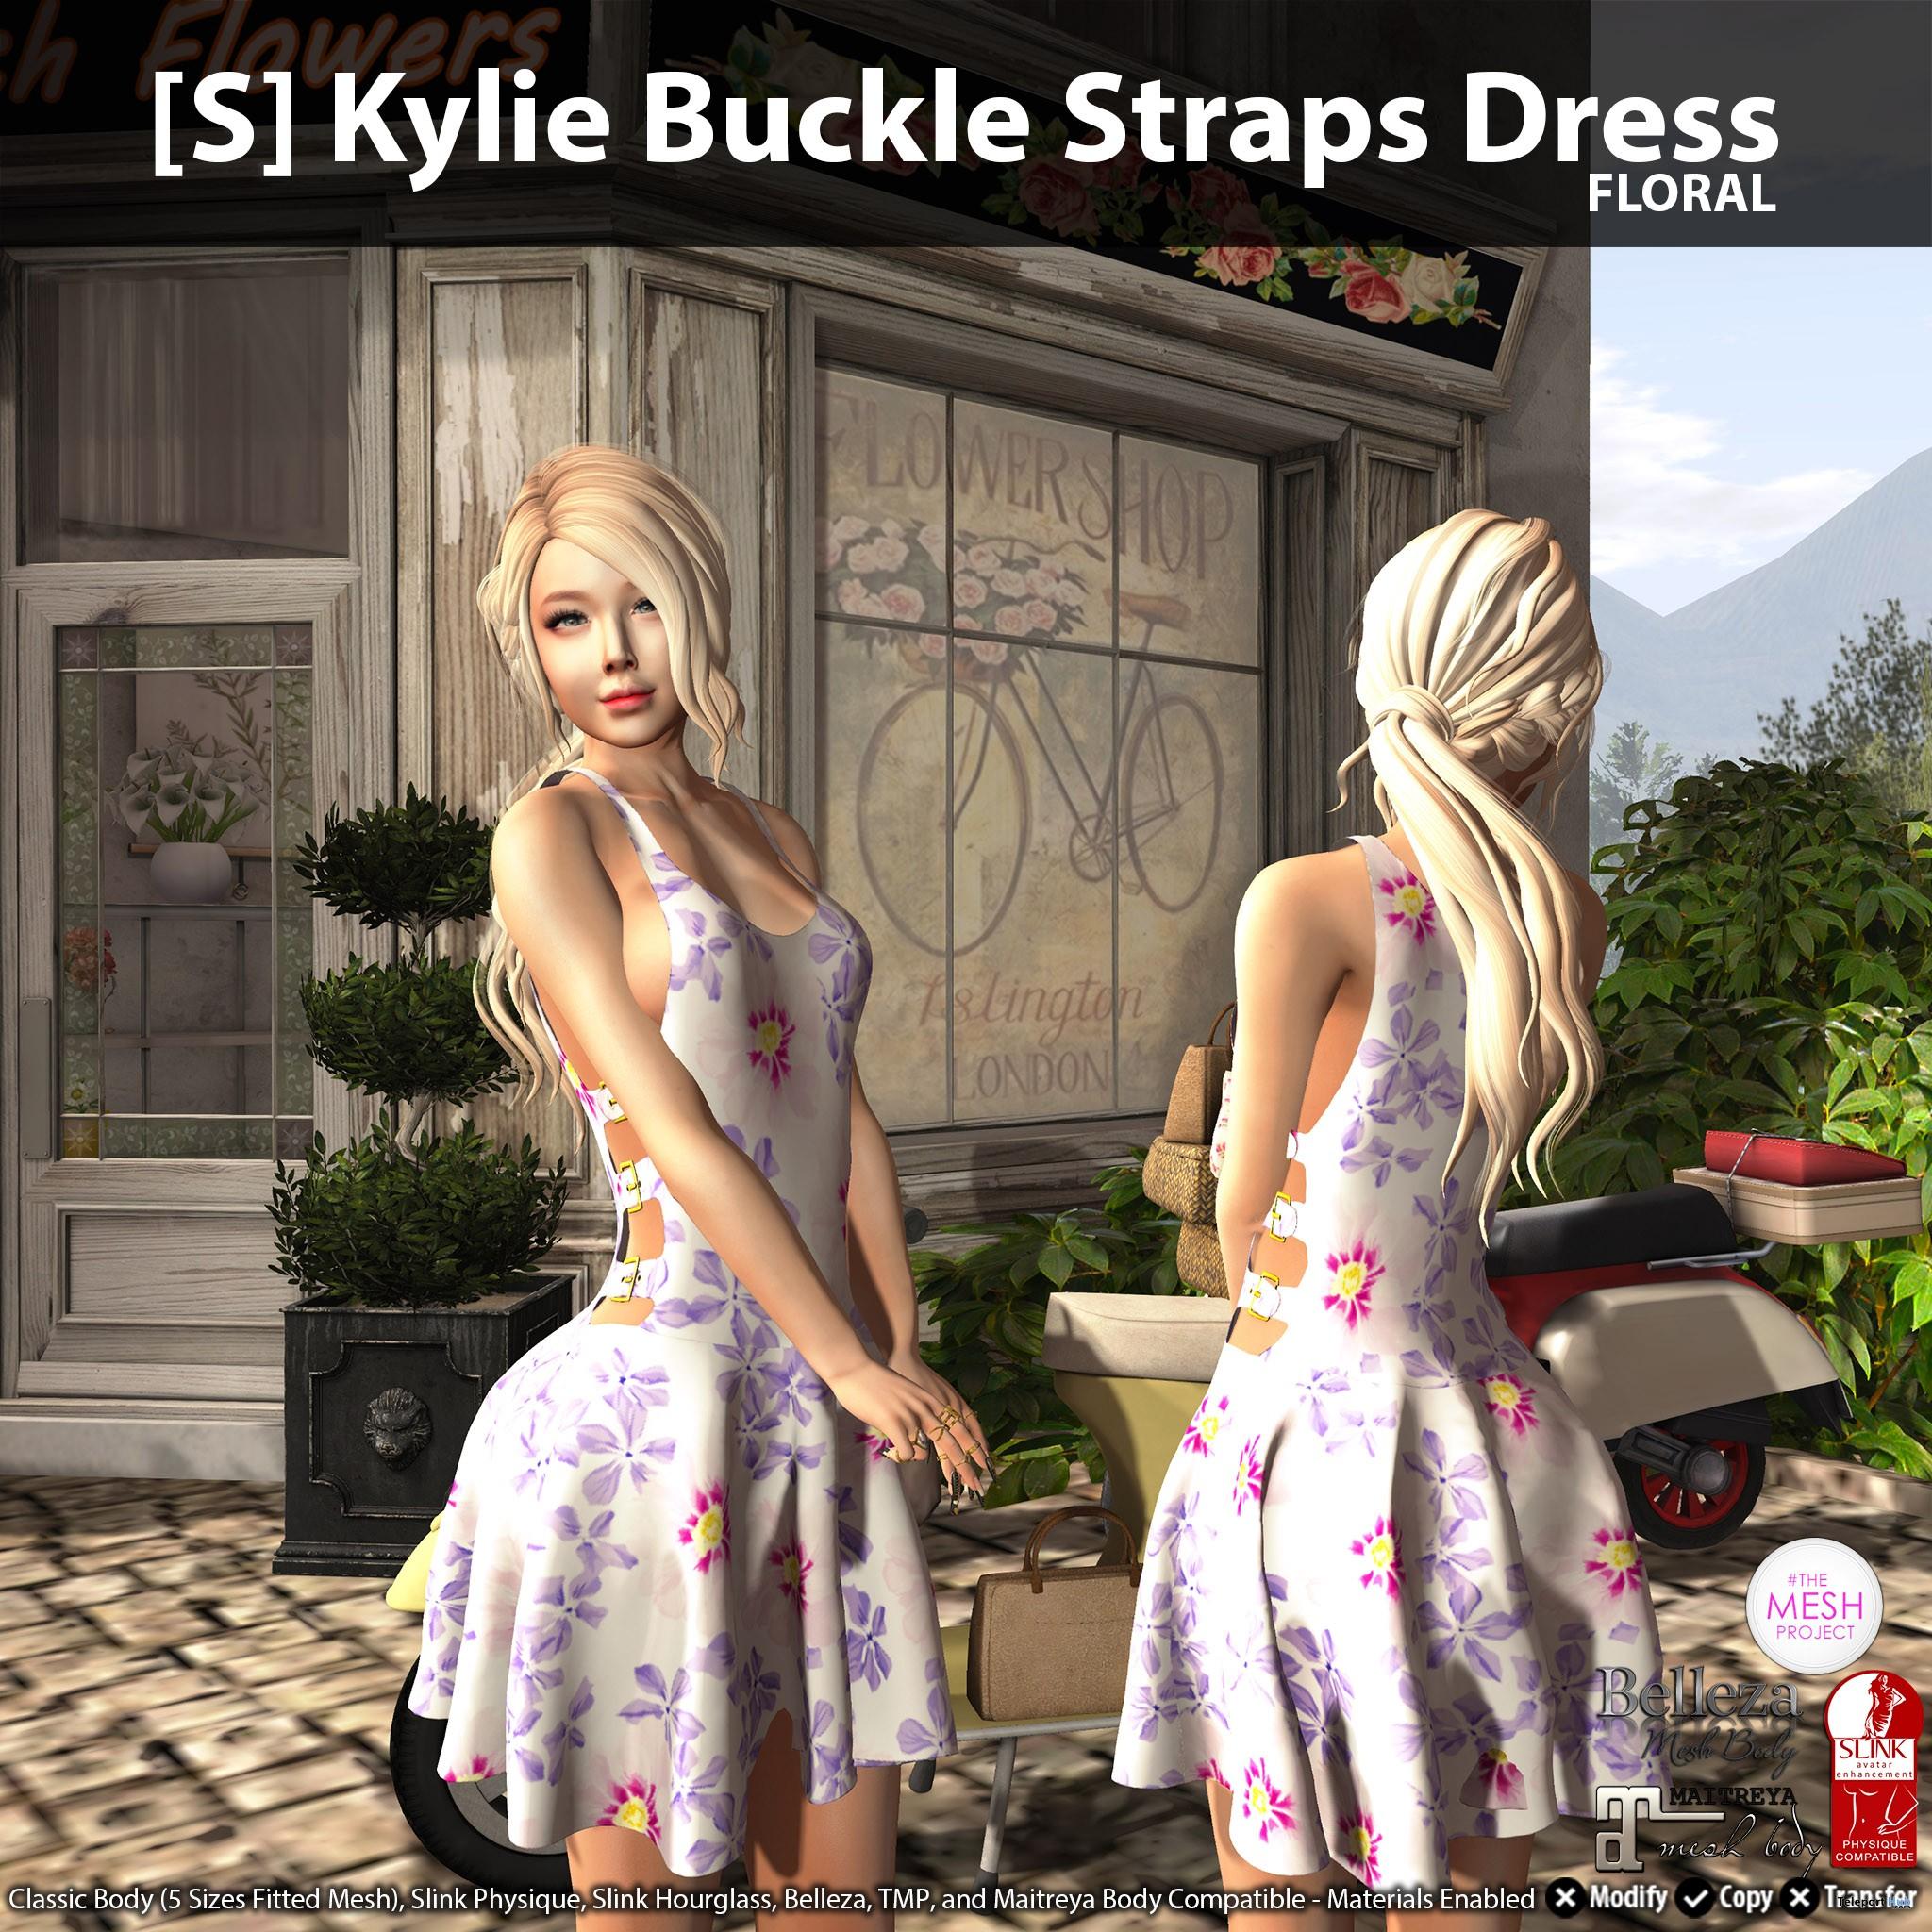 New Release: [S] Kylie Buckle Straps Dress by [satus Inc] - Teleport Hub - teleporthub.com